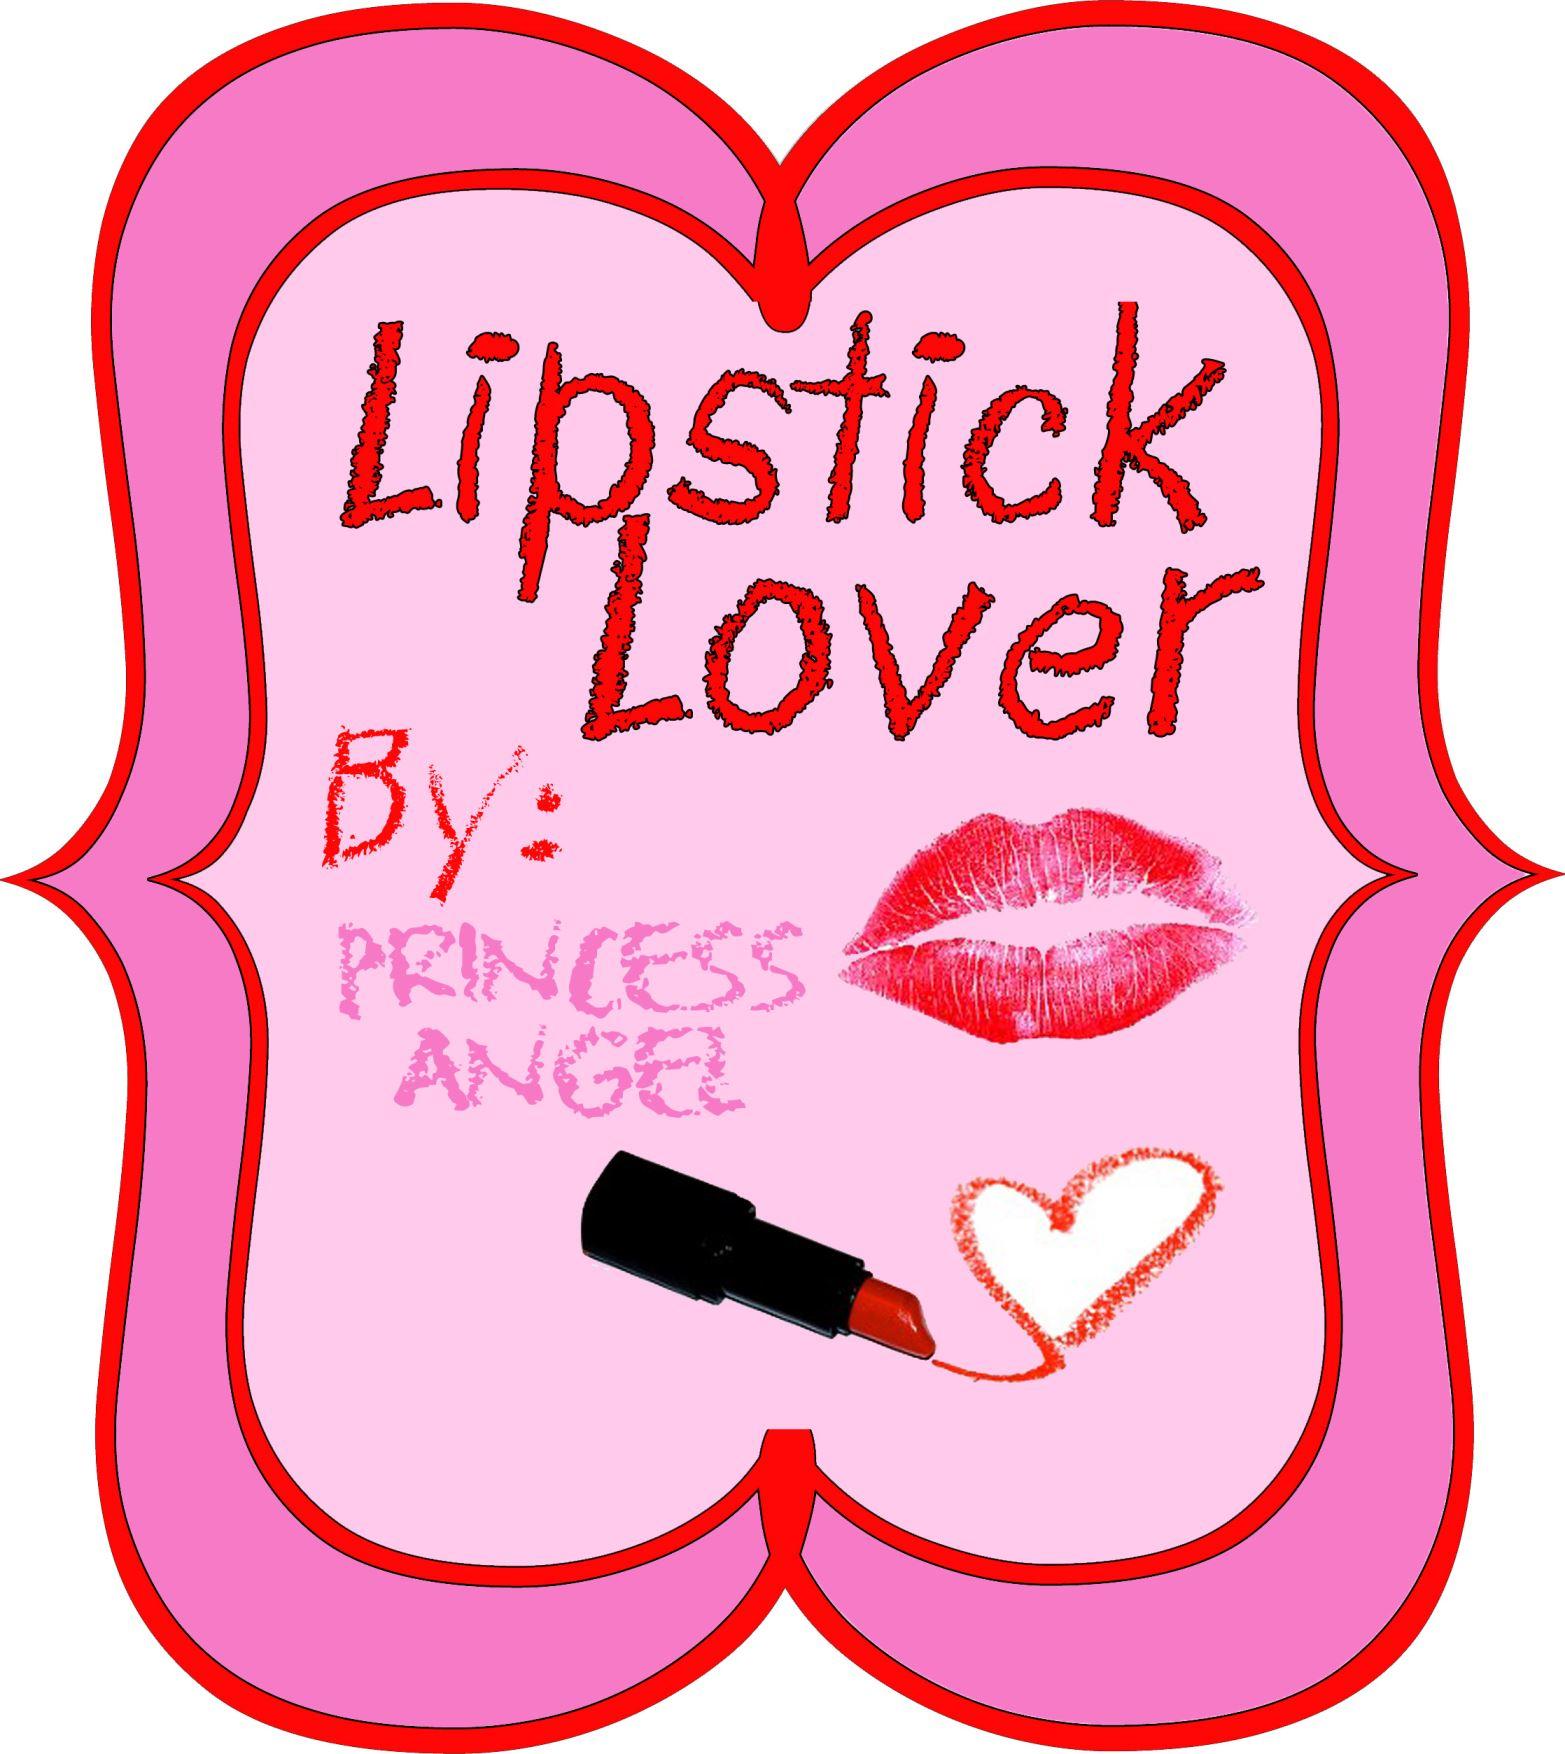 Lipstick Lover Hypnosis